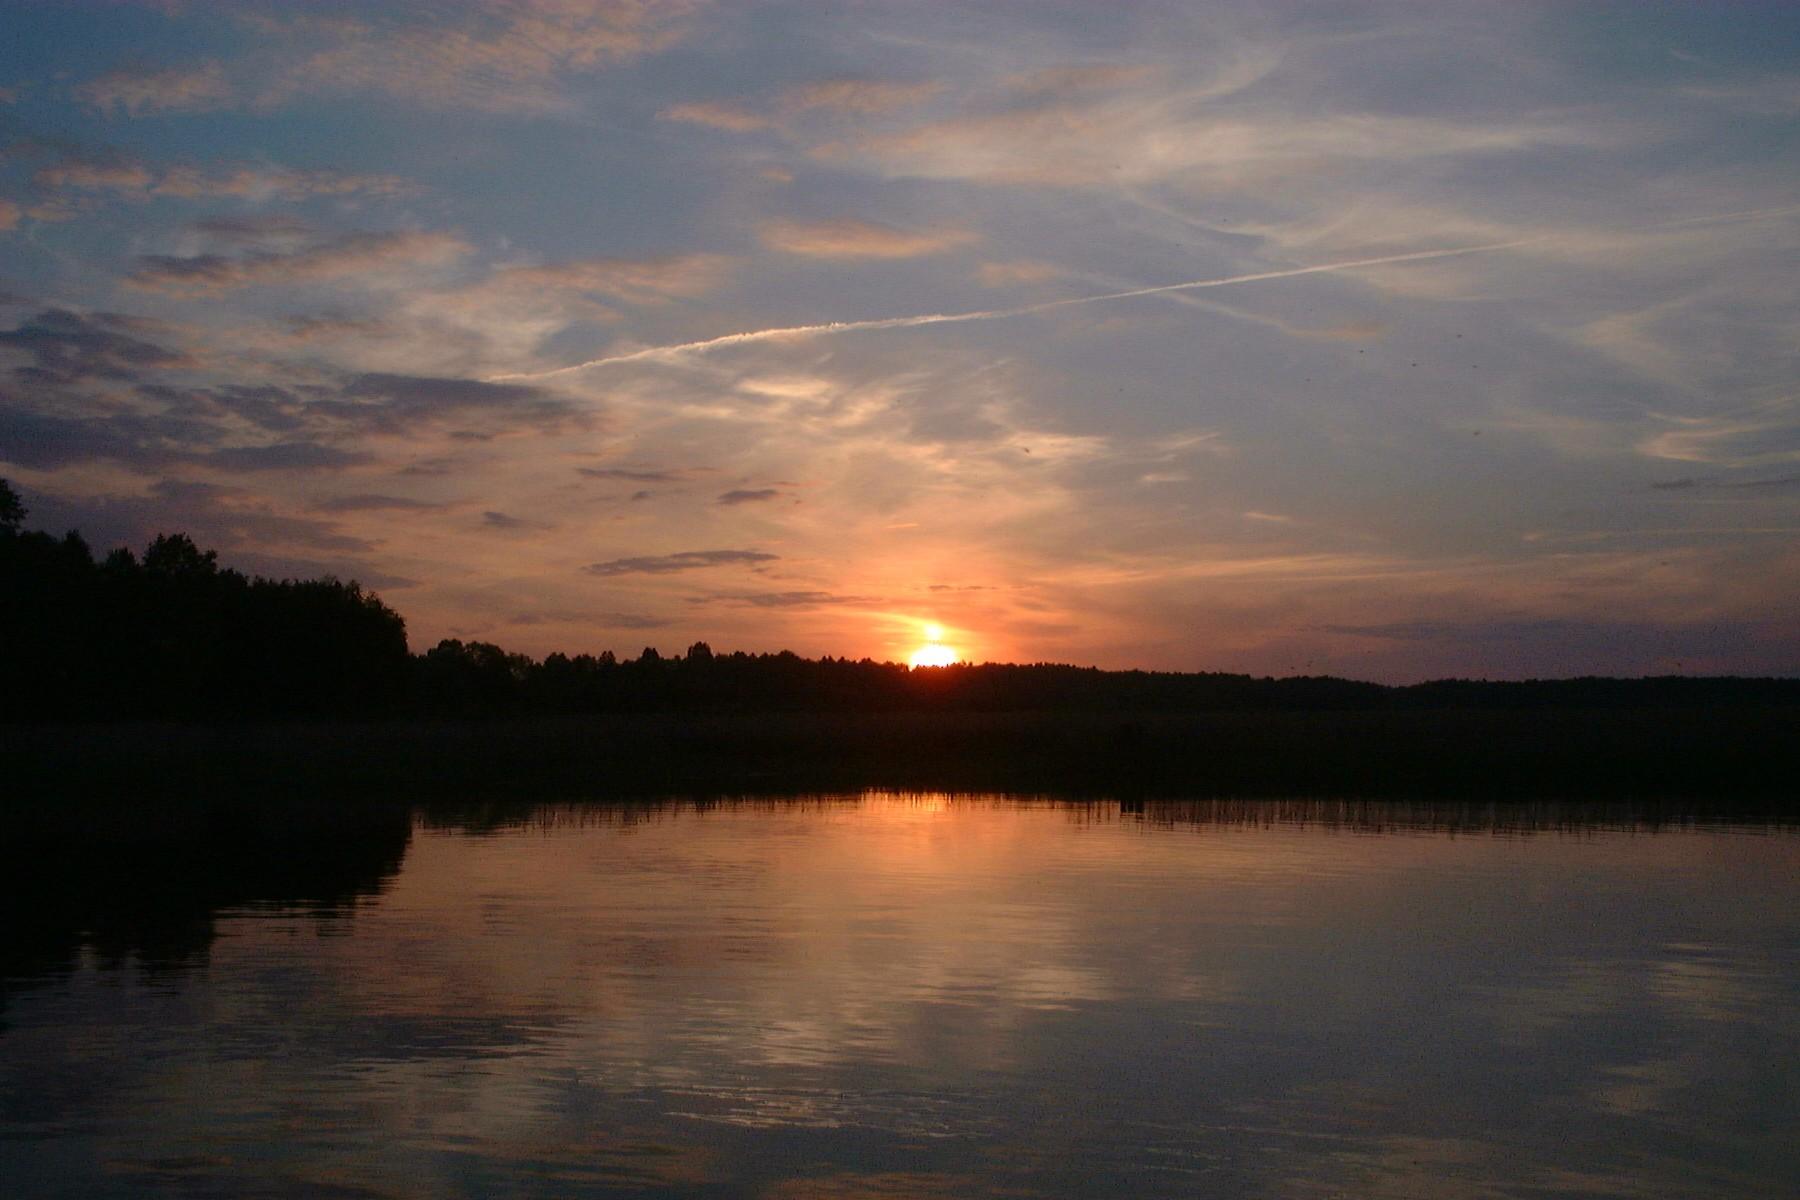 http://upload.wikimedia.org/wikipedia/commons/0/01/Poland_Ros_Lake_sunset.jpg